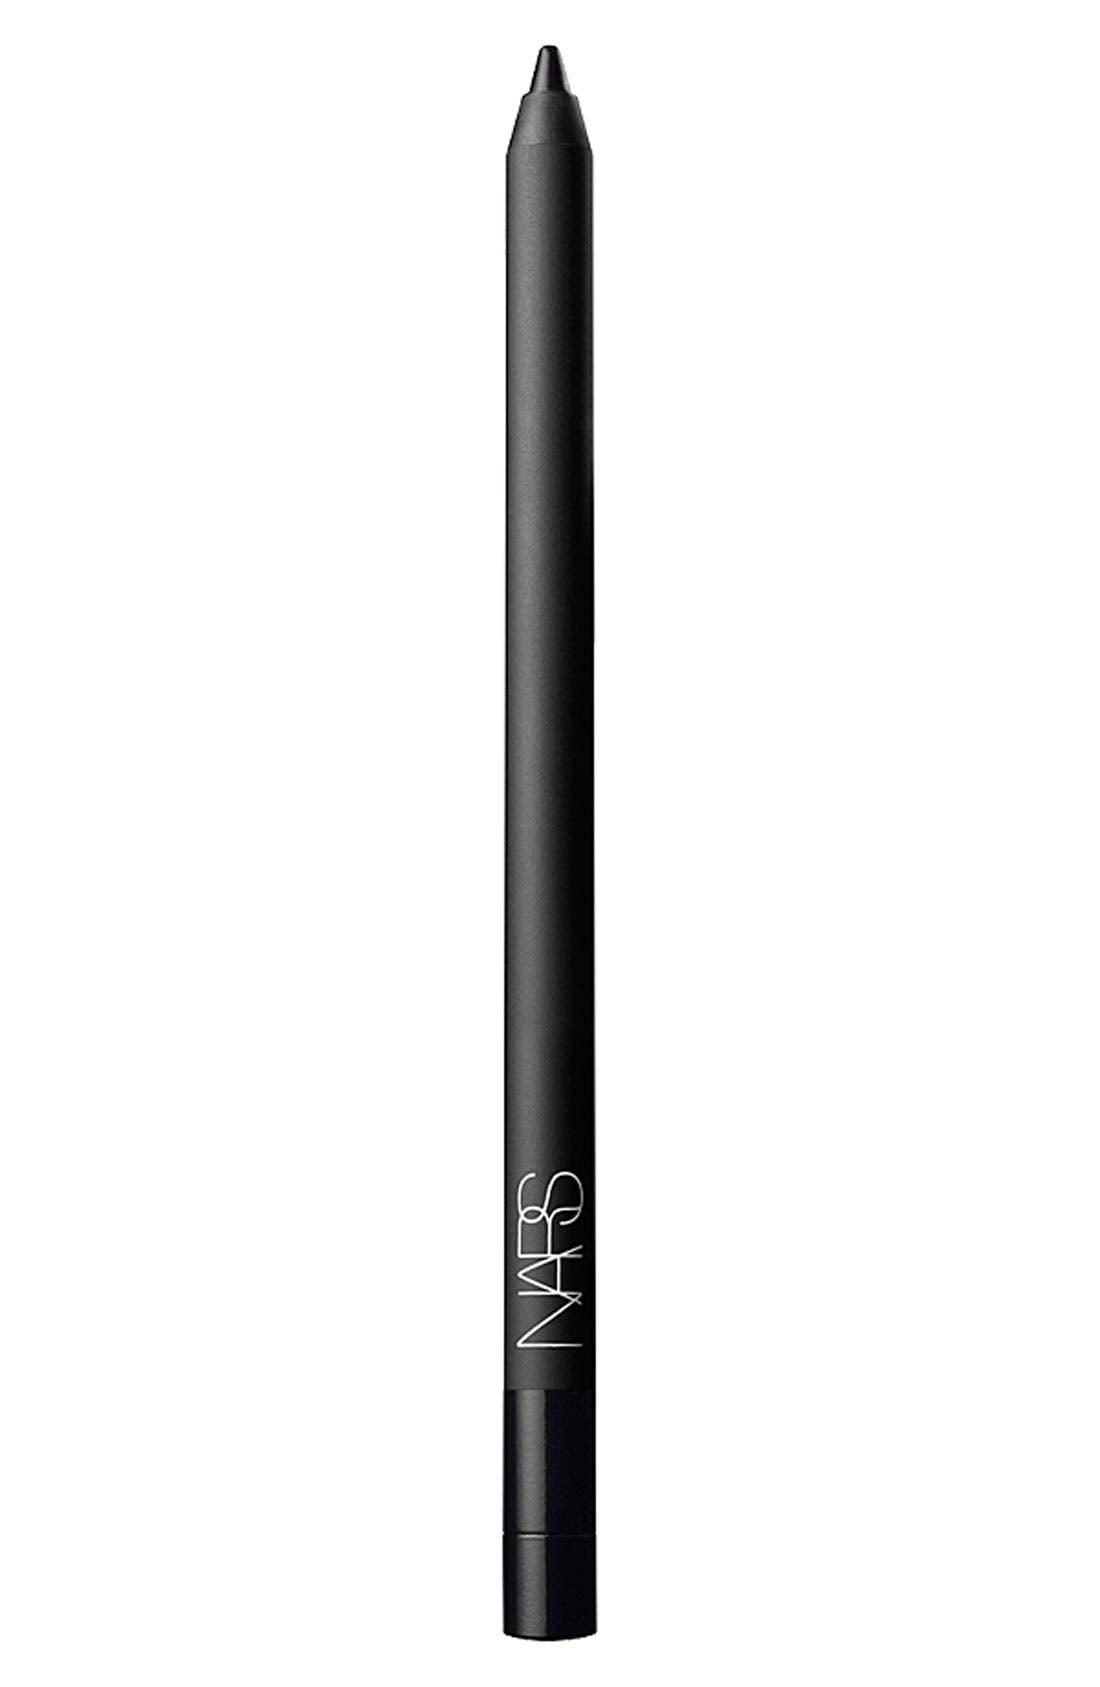 NARS, Larger Than Life Long Wear Eyeliner, Main thumbnail 1, color, VIA VENETO